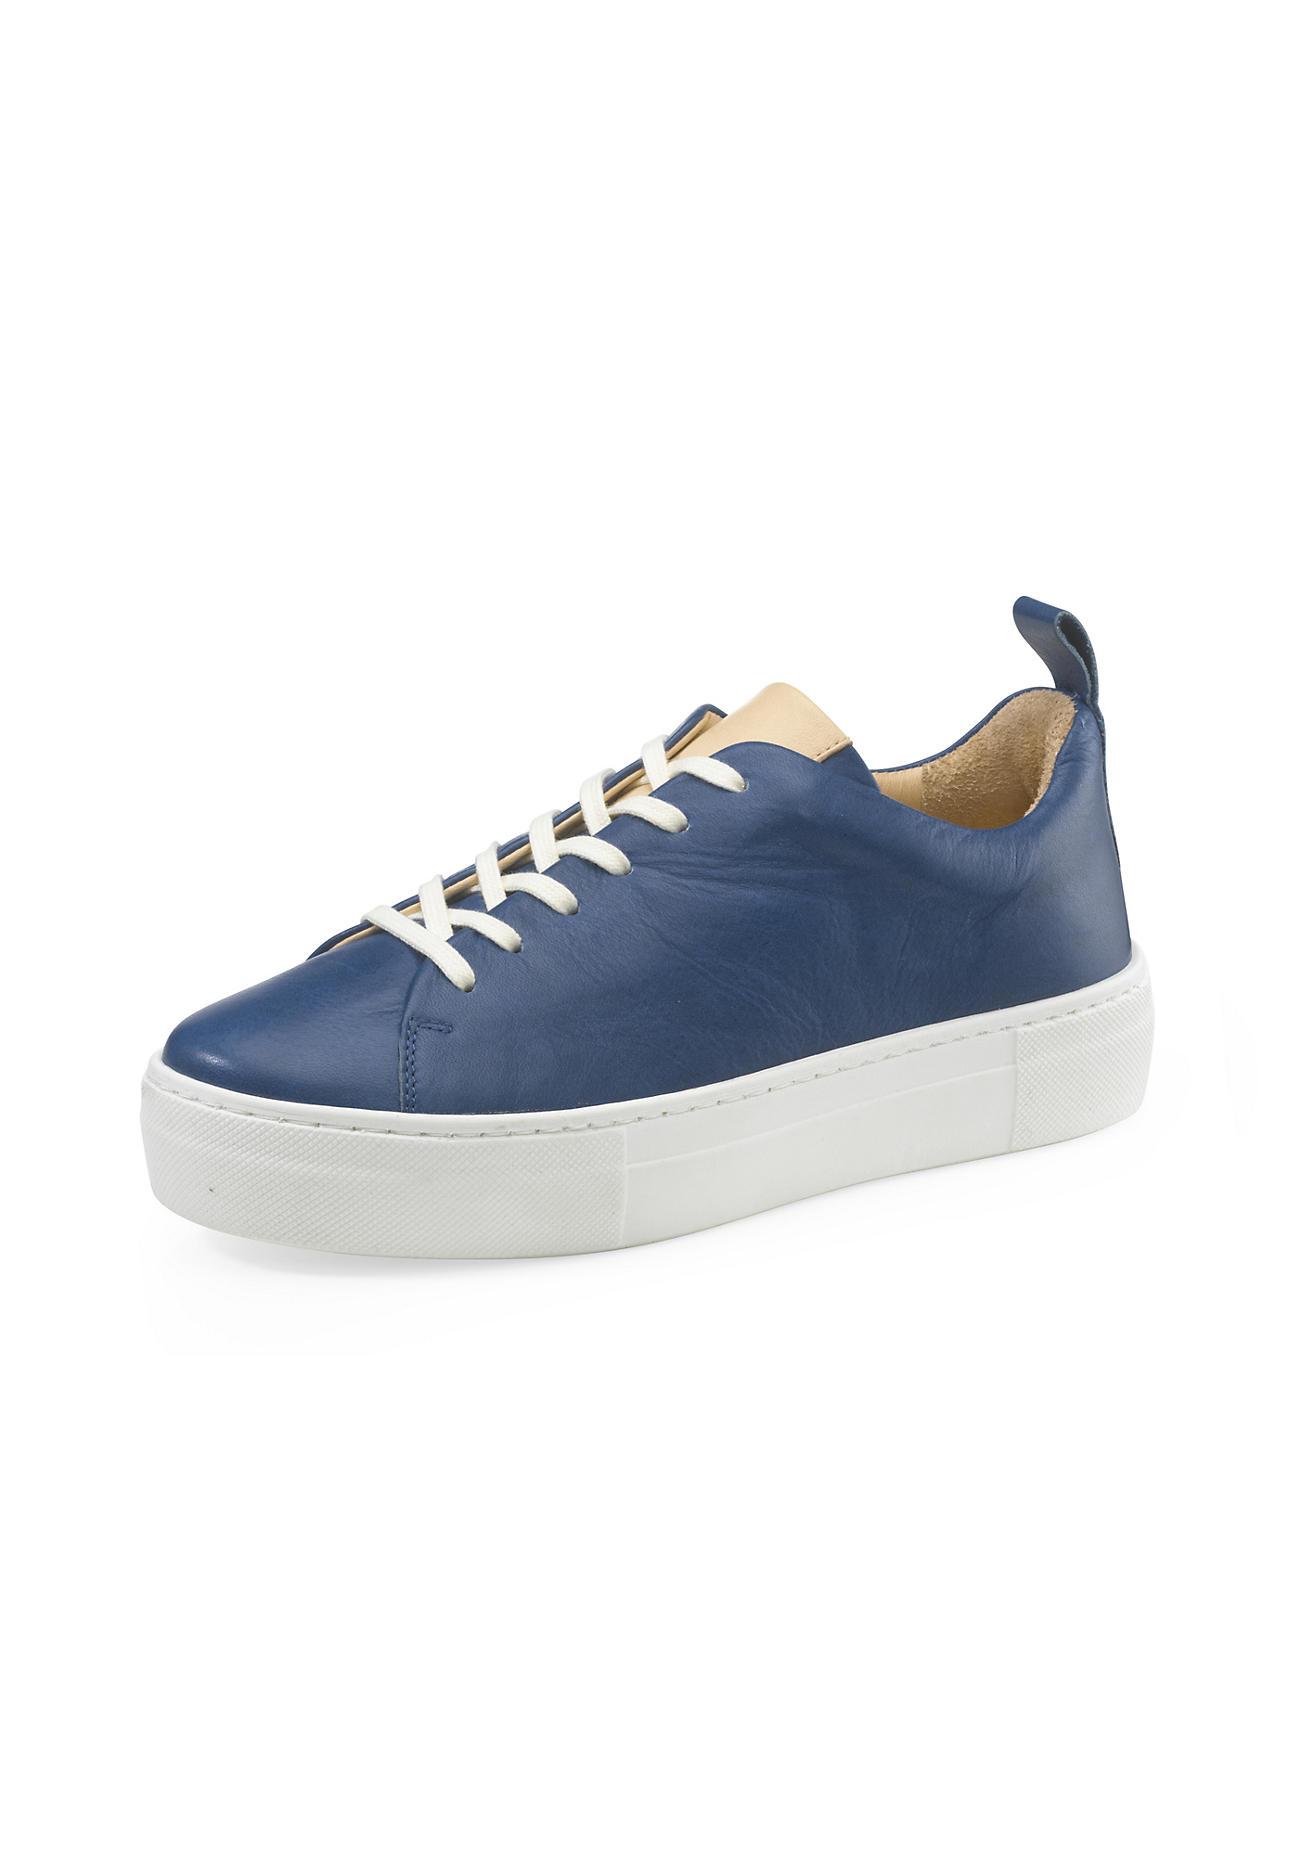 hessnatur Damen Damen Sneaker aus Leder – blau – Größe 36